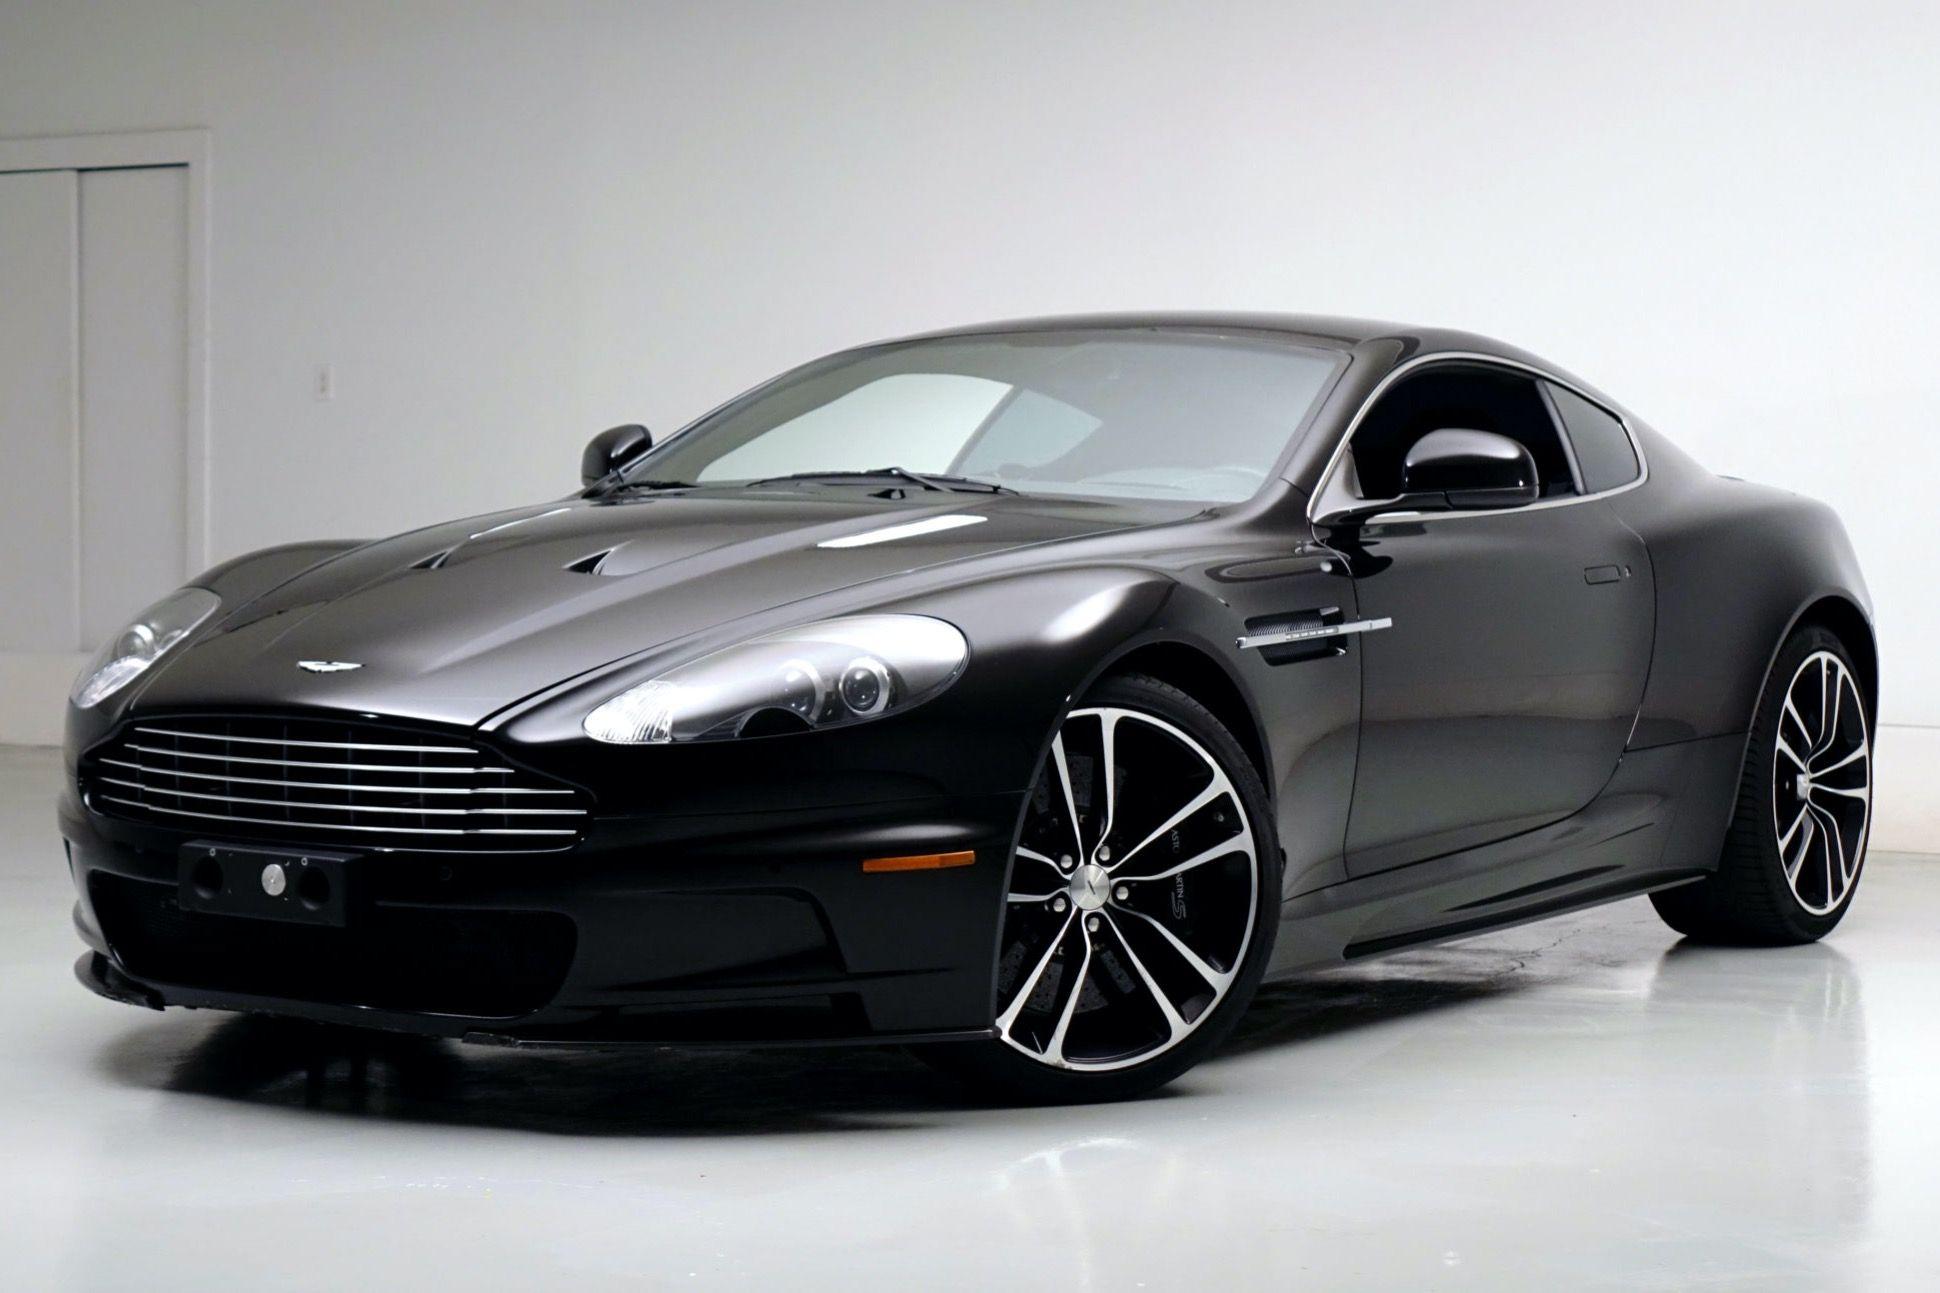 2010 Aston Martin Dbs Carbon Black Special Edition Vin Scffdcbd9age02211 Classic Com